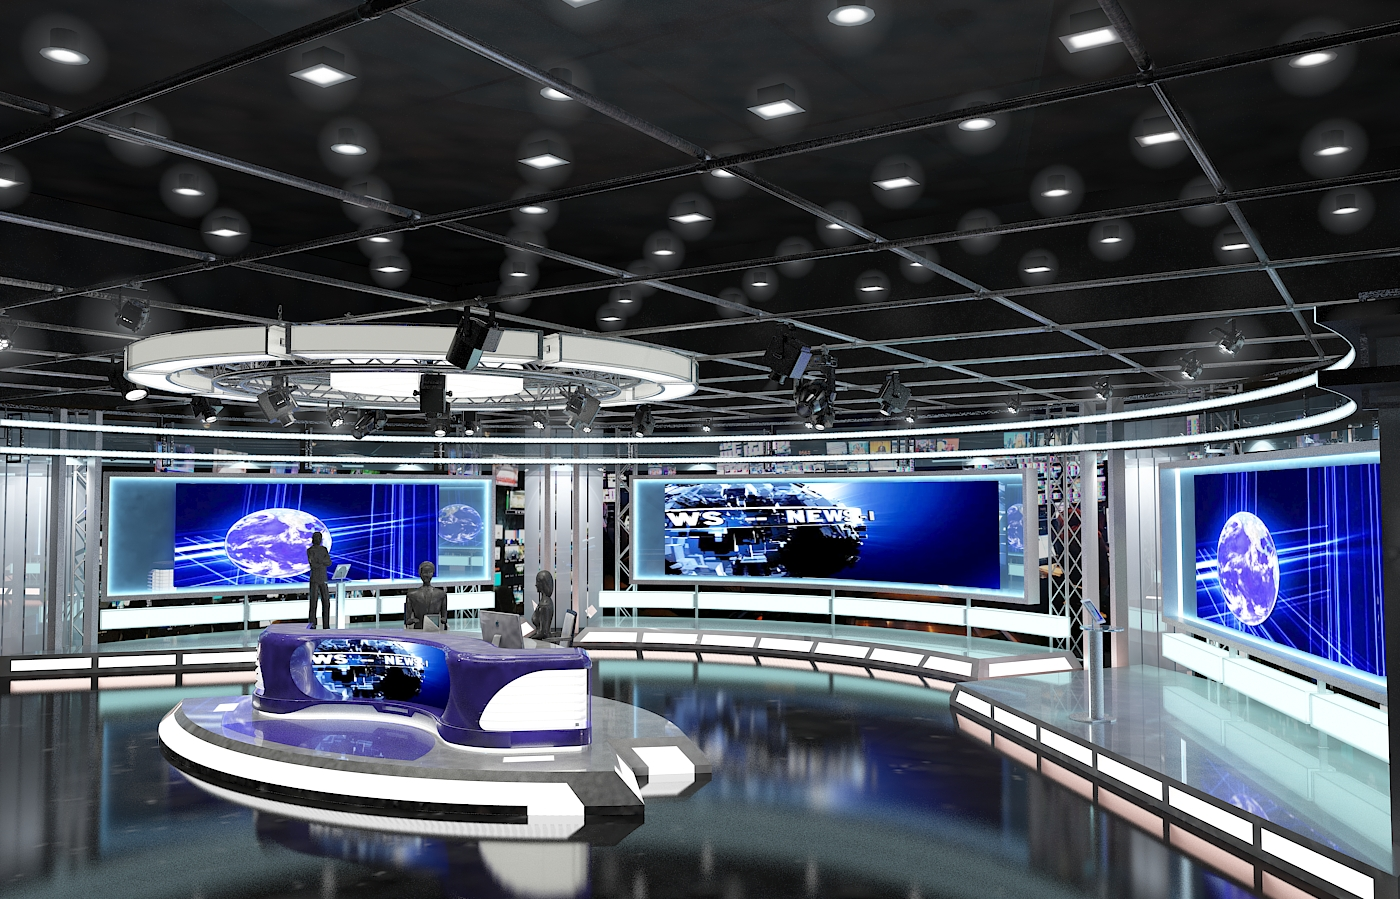 Virtual tv studio news set 1 3d model flatpyramid - Architecture shows ...